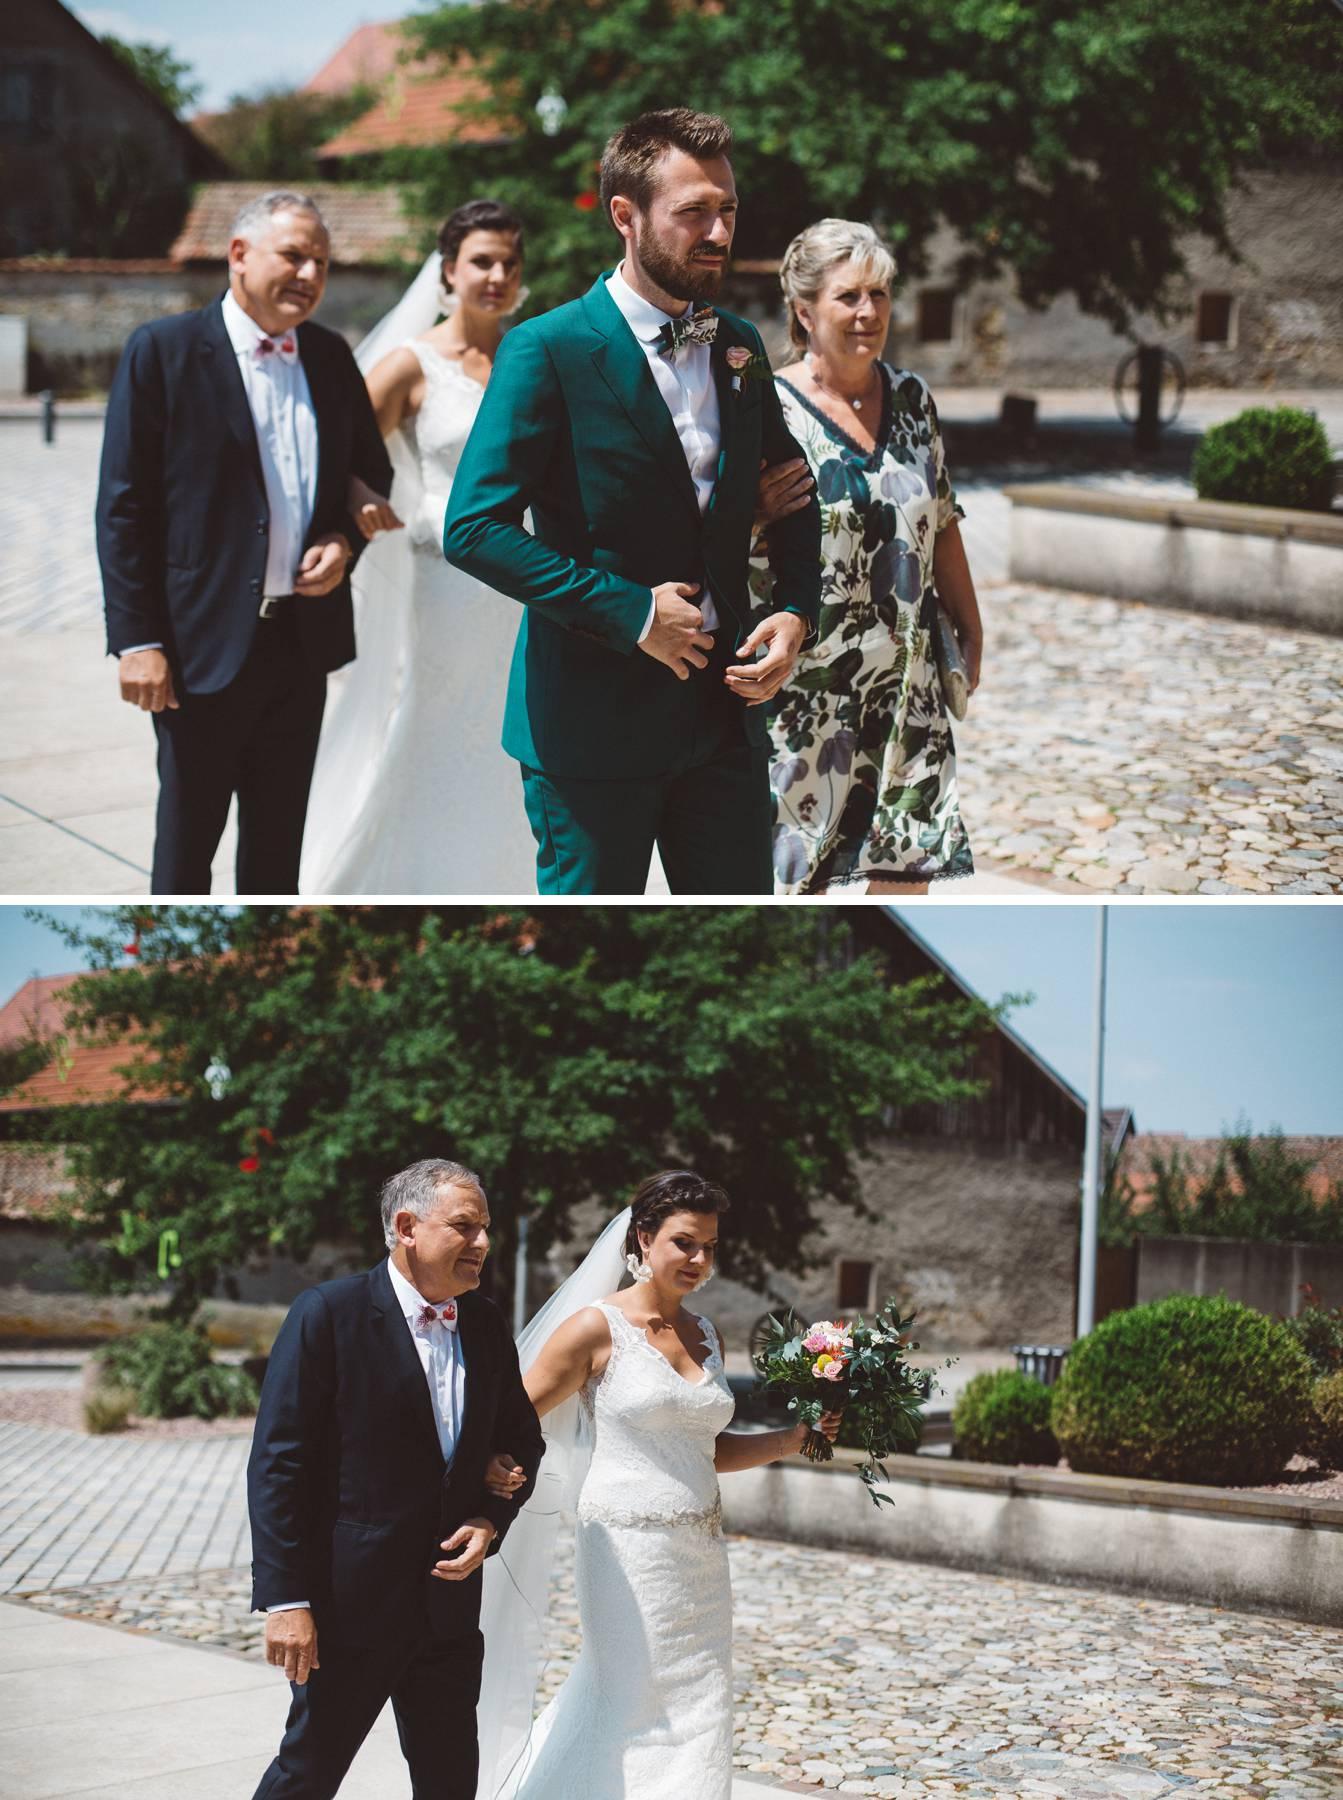 mariage-tropical-raben-horben_0007.jpg